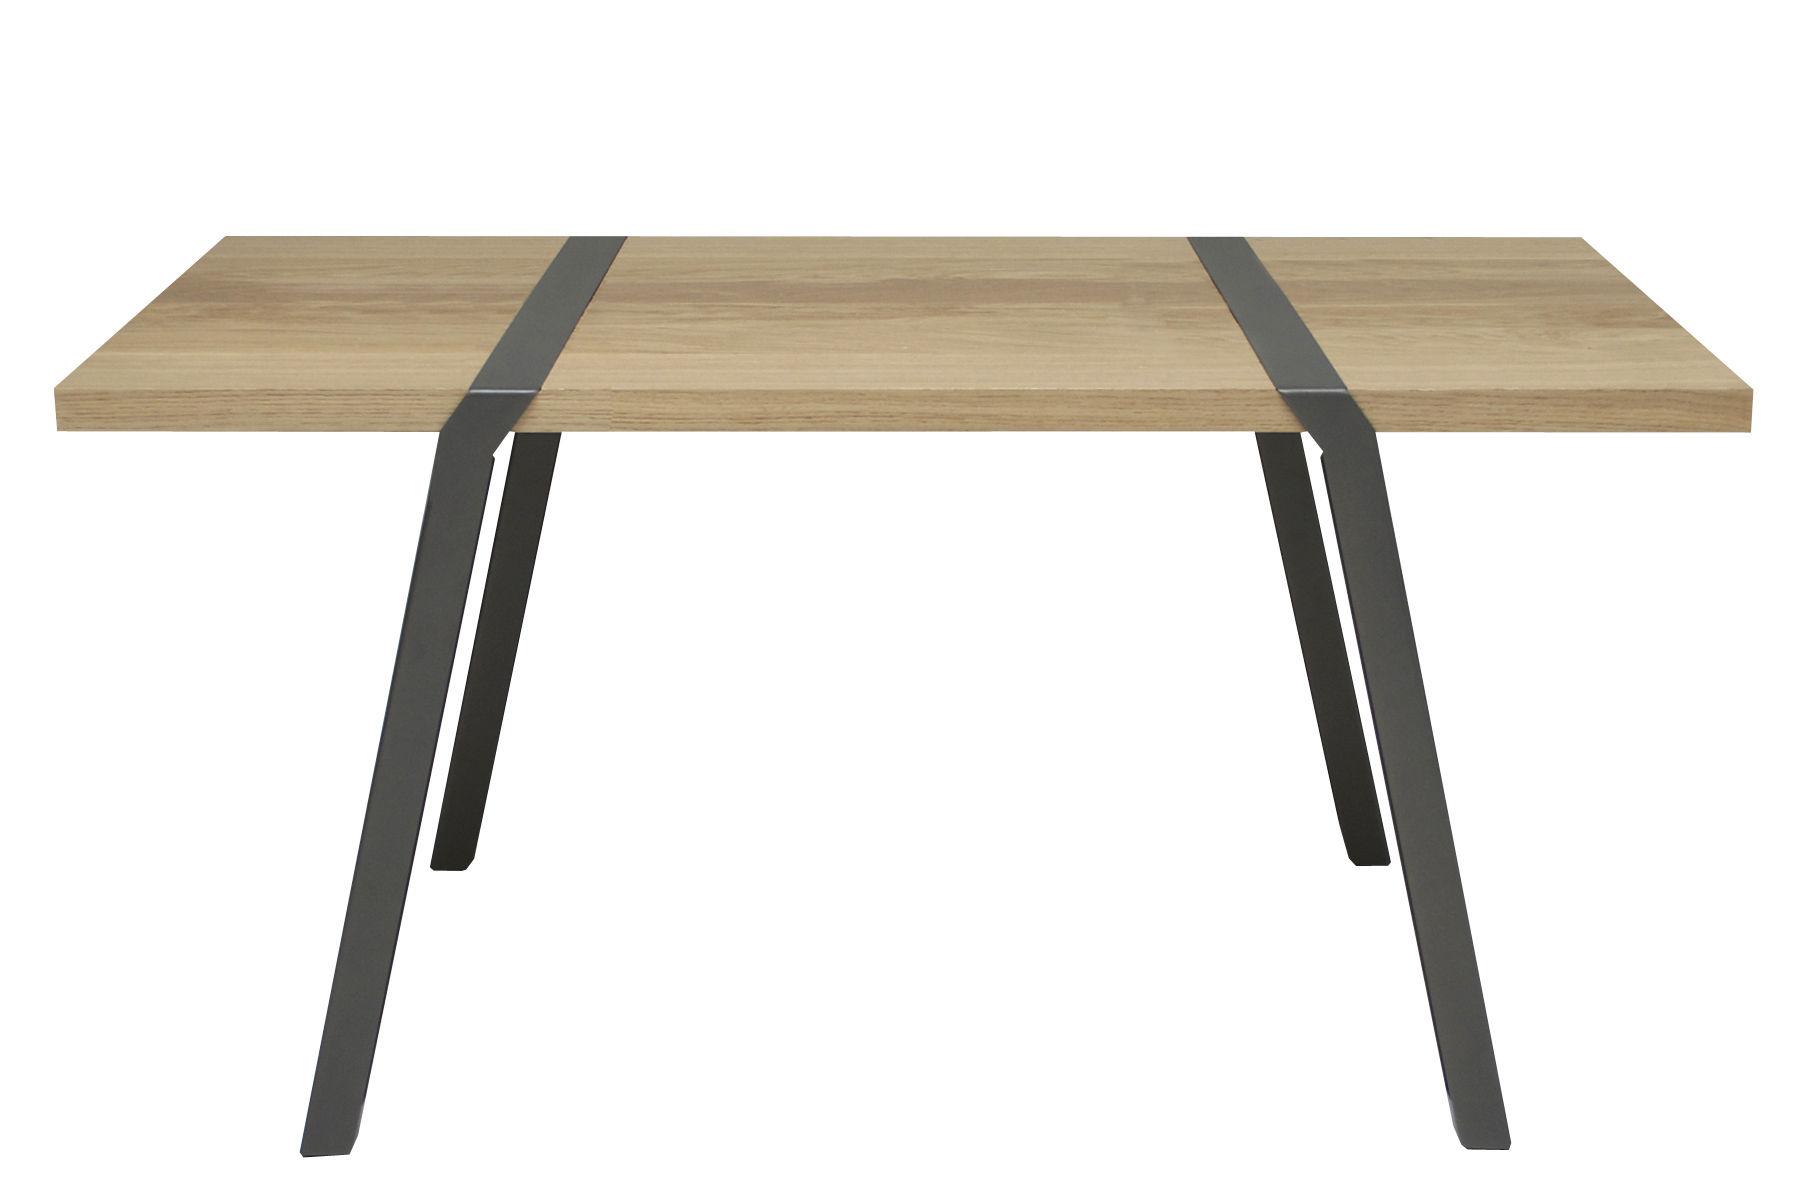 table pi bureau 150 x 75 cm gris canon de fusil l 150 cm moaroom. Black Bedroom Furniture Sets. Home Design Ideas